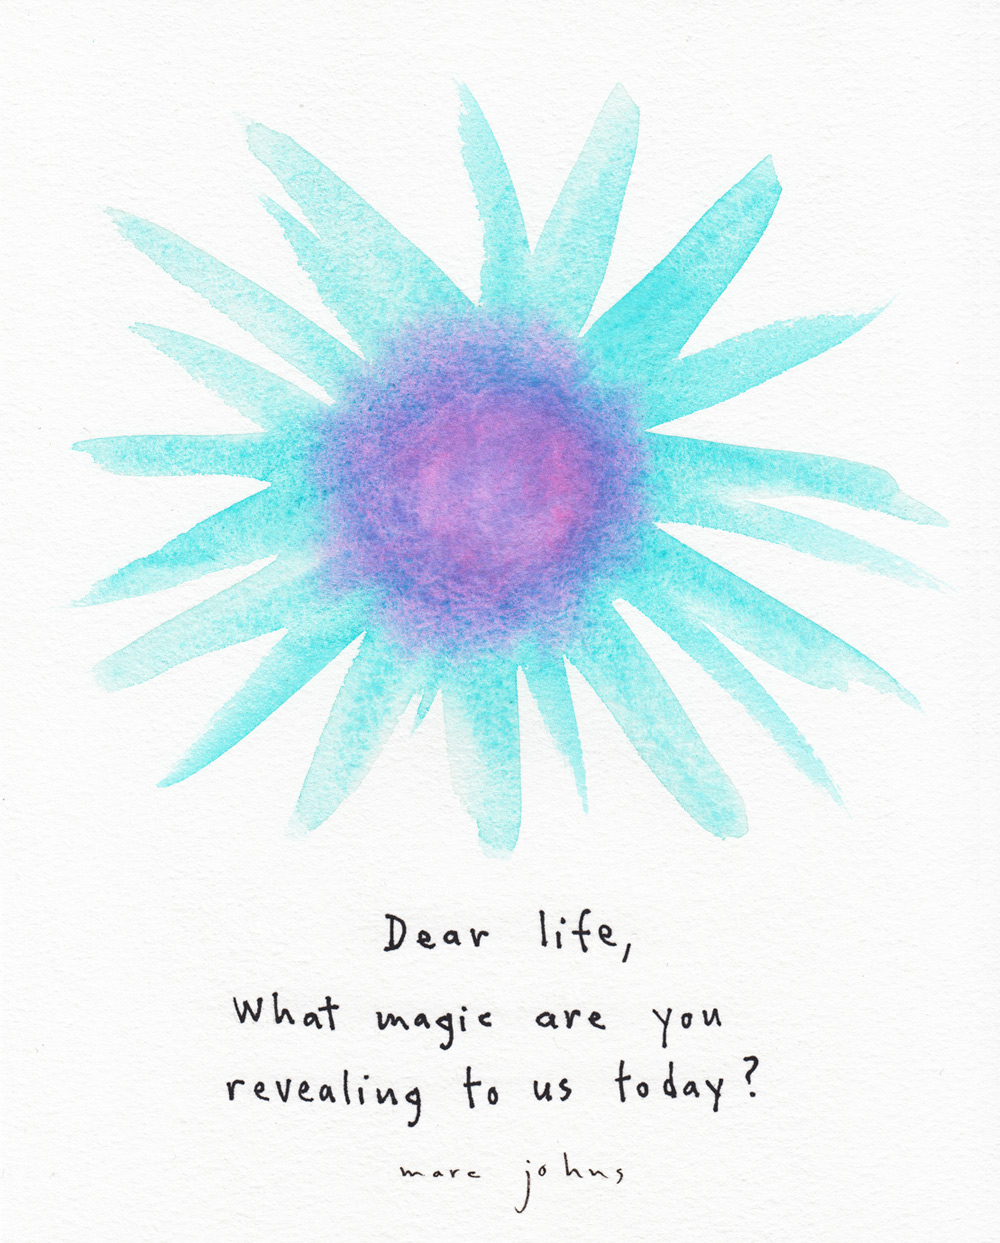 dear-life-magic-ig.jpg